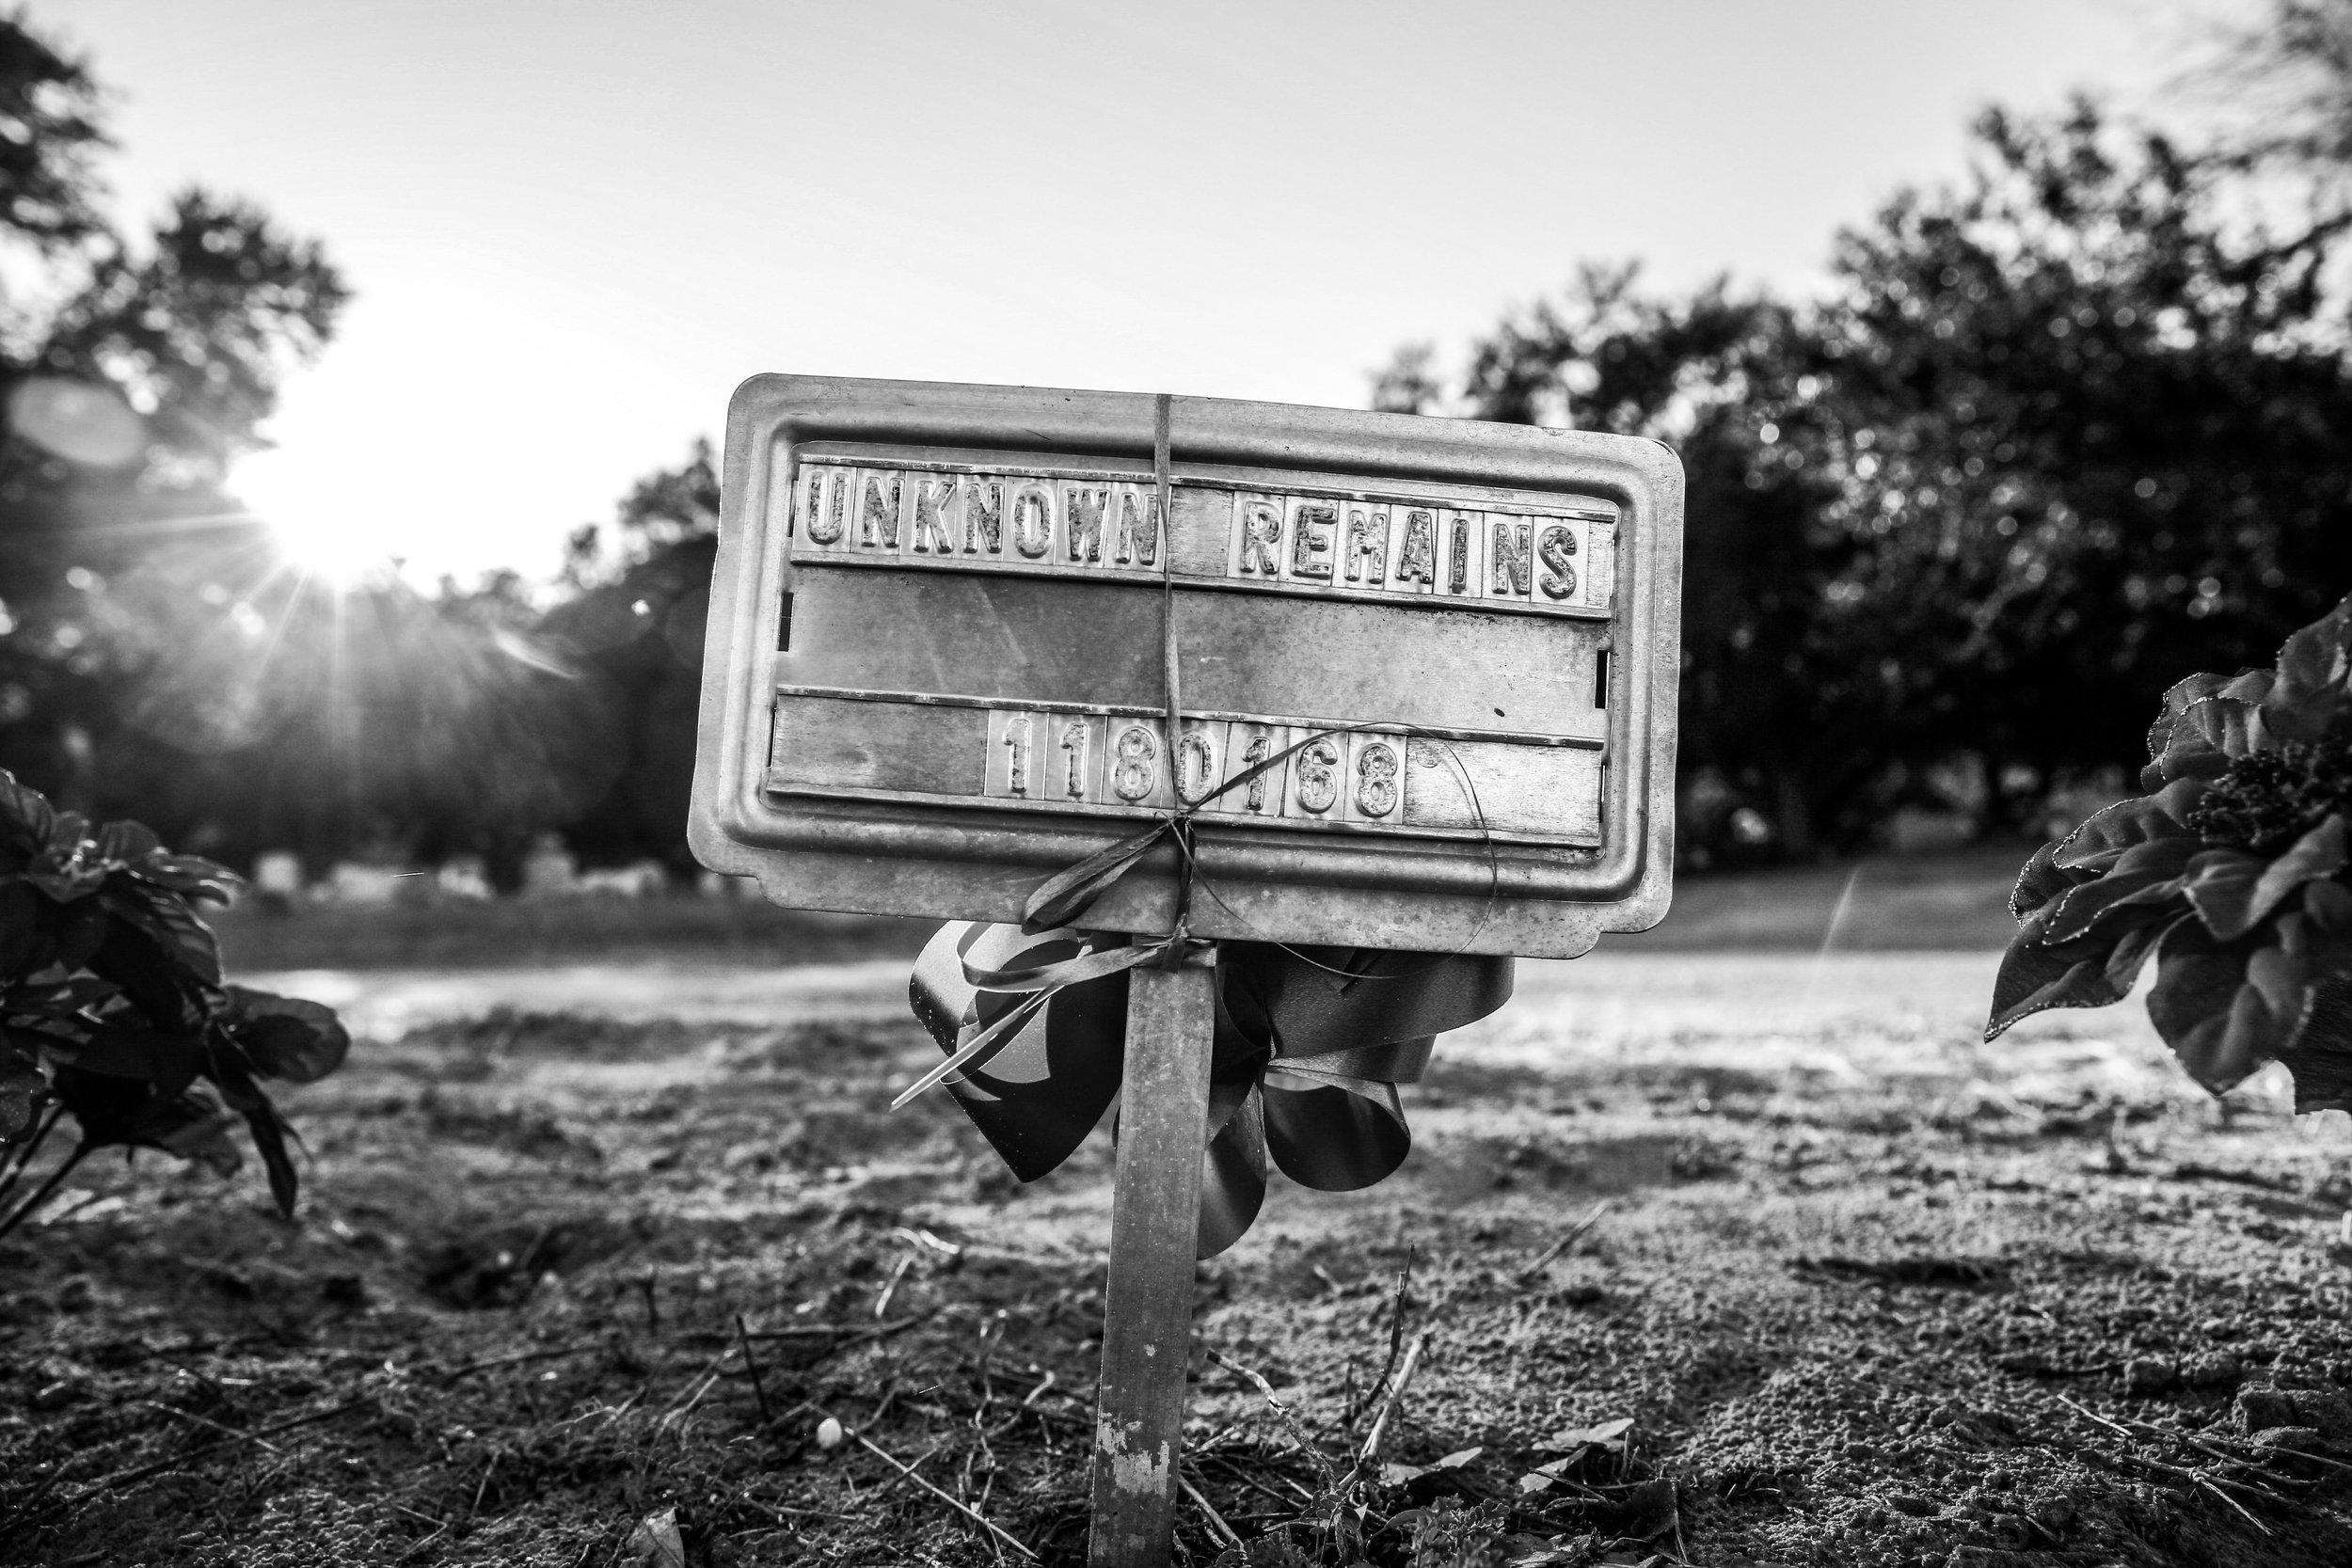 Unknown Remains     Falfurrias, Texas